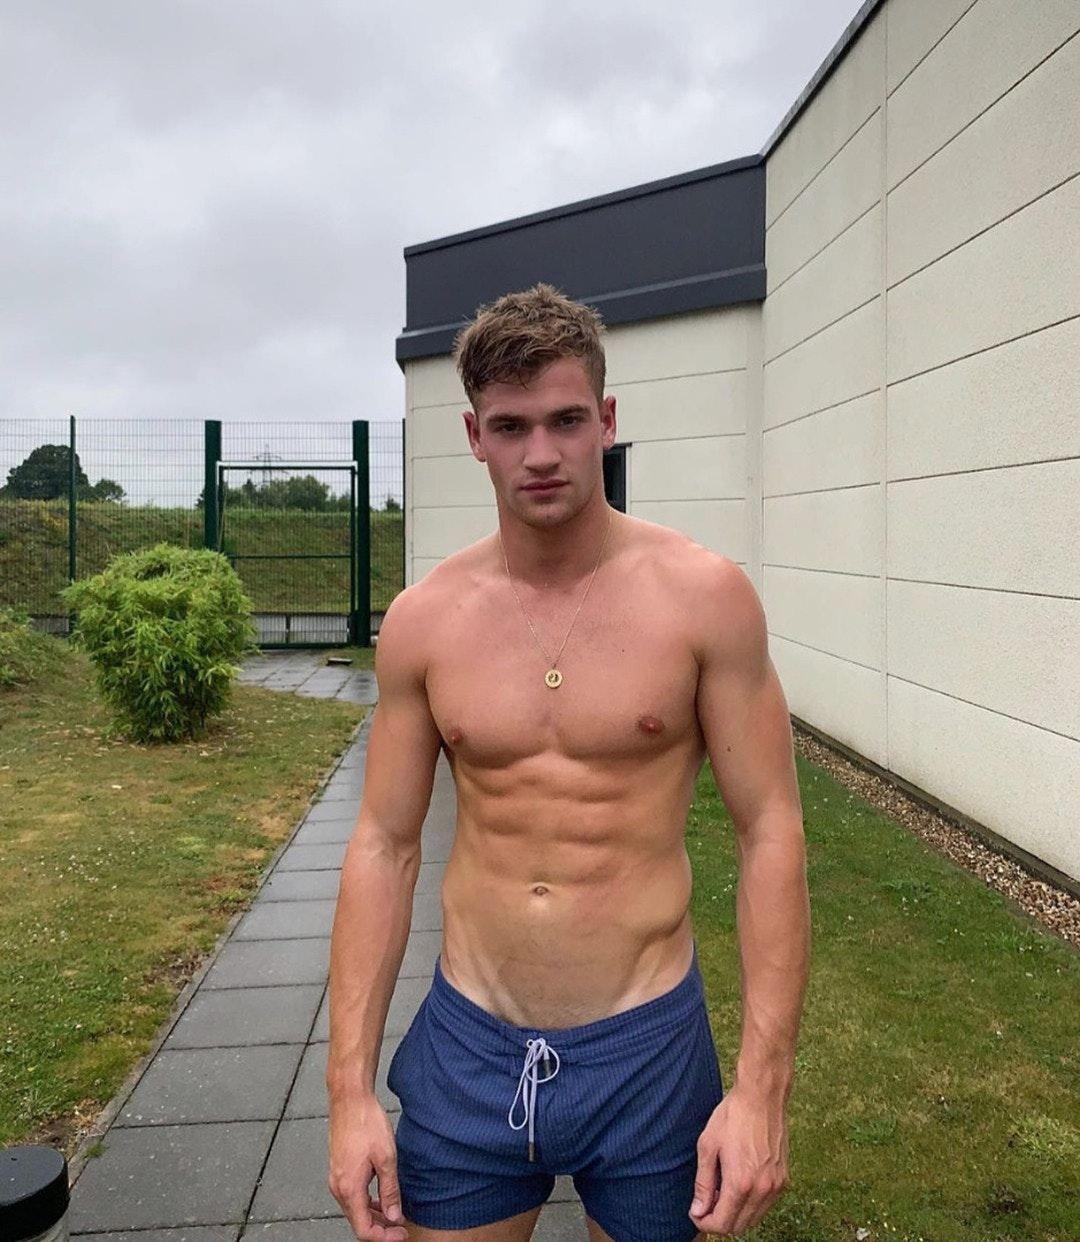 #mattycarrington #men #shirtlessguys #abs #malecelebs